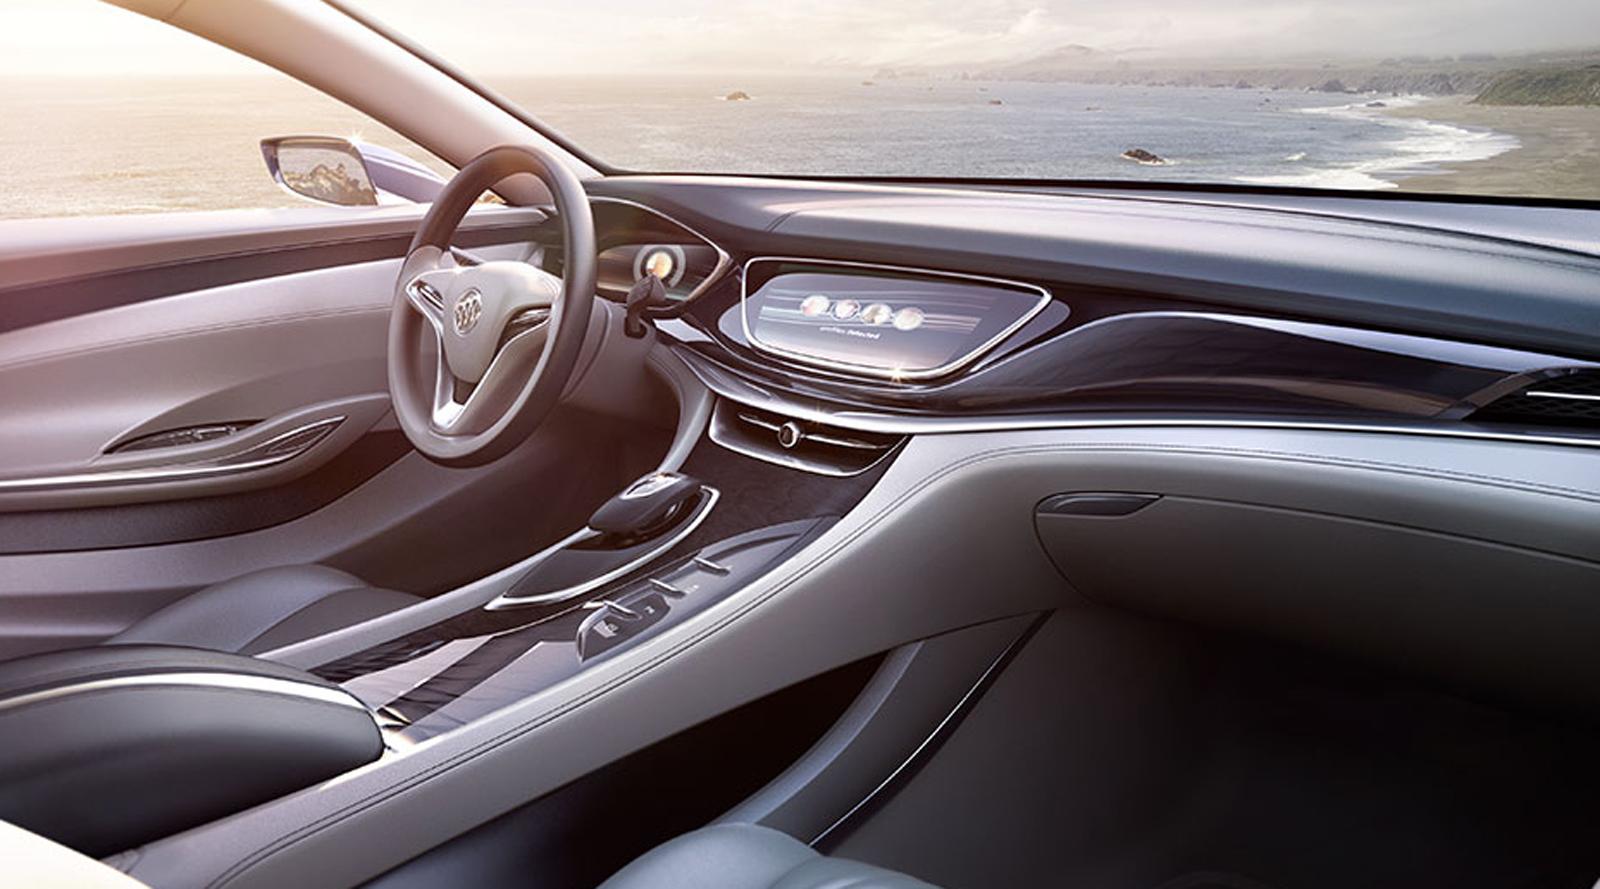 2015 eyes on design winners announced. detroit auto show ...